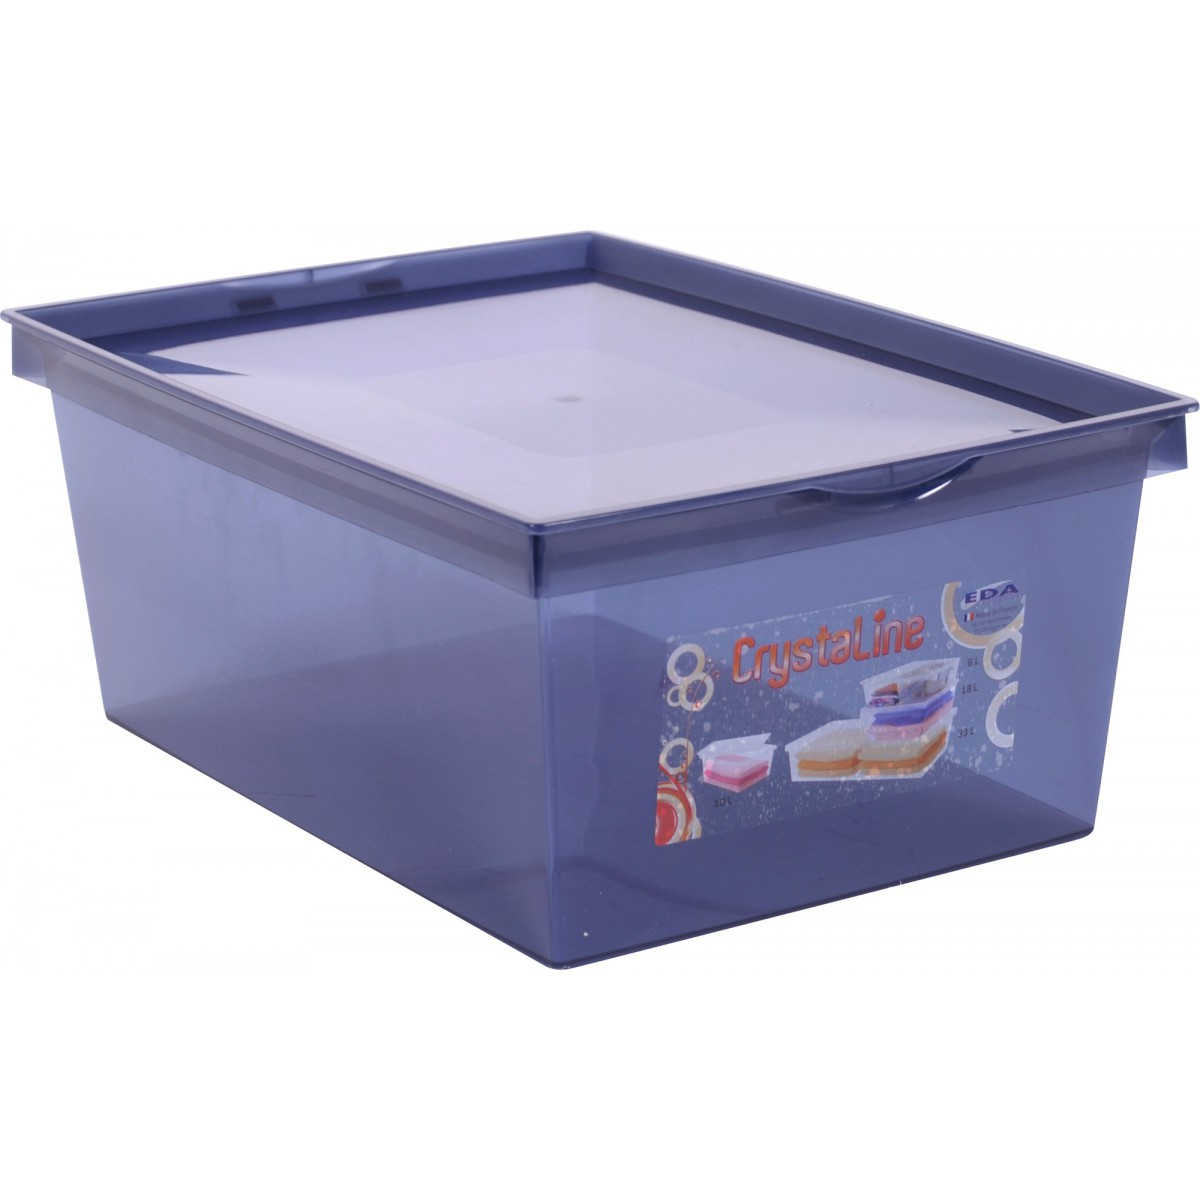 Boîte de rangement plastique Crystaline Eda - 10 l - Bleu profond